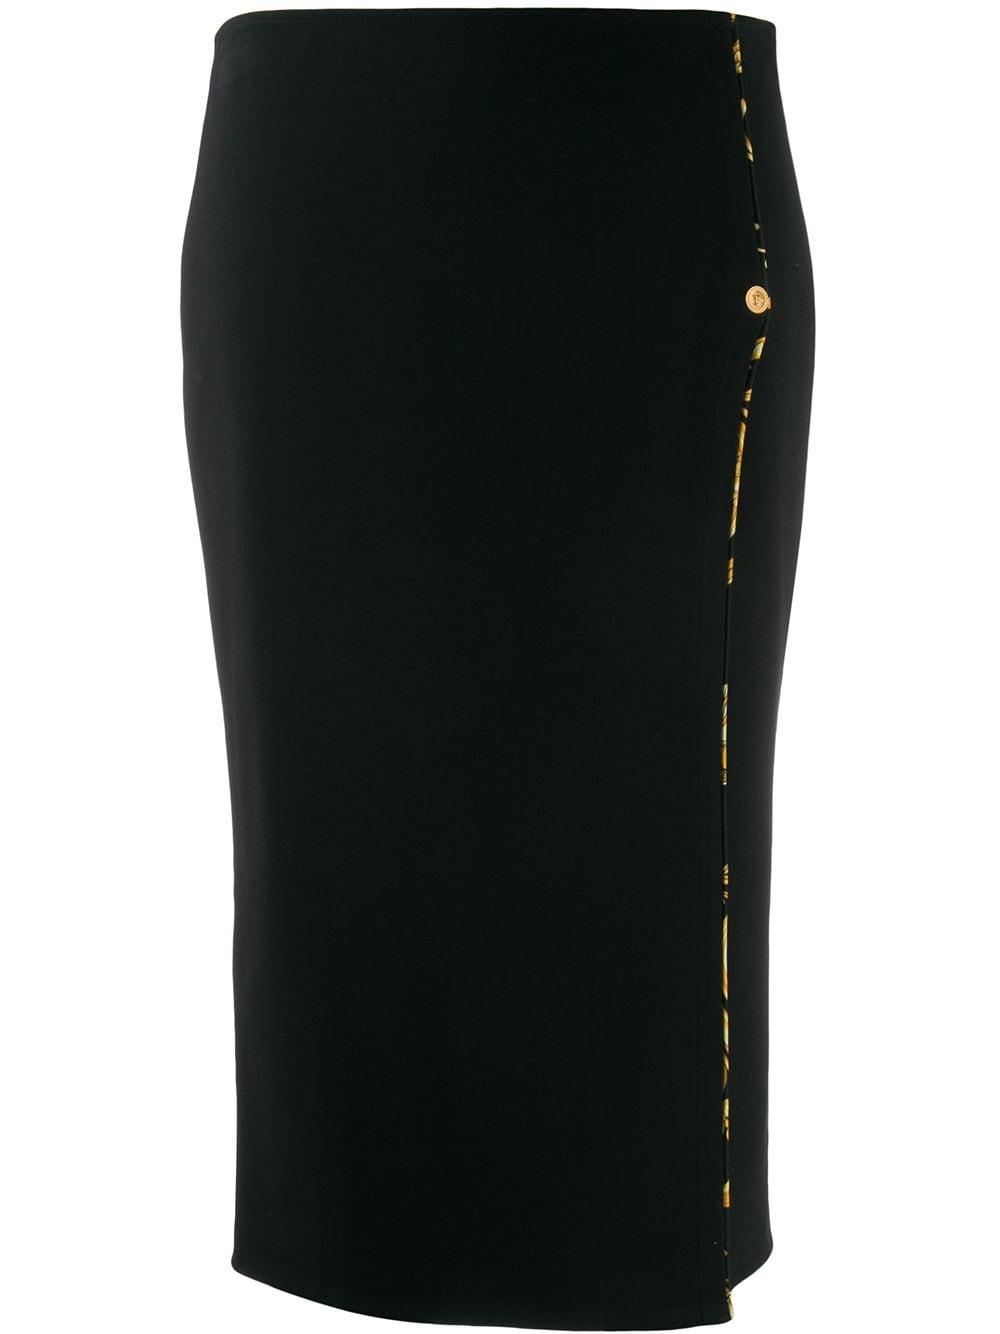 Versace Barocco print lined pencil skirt